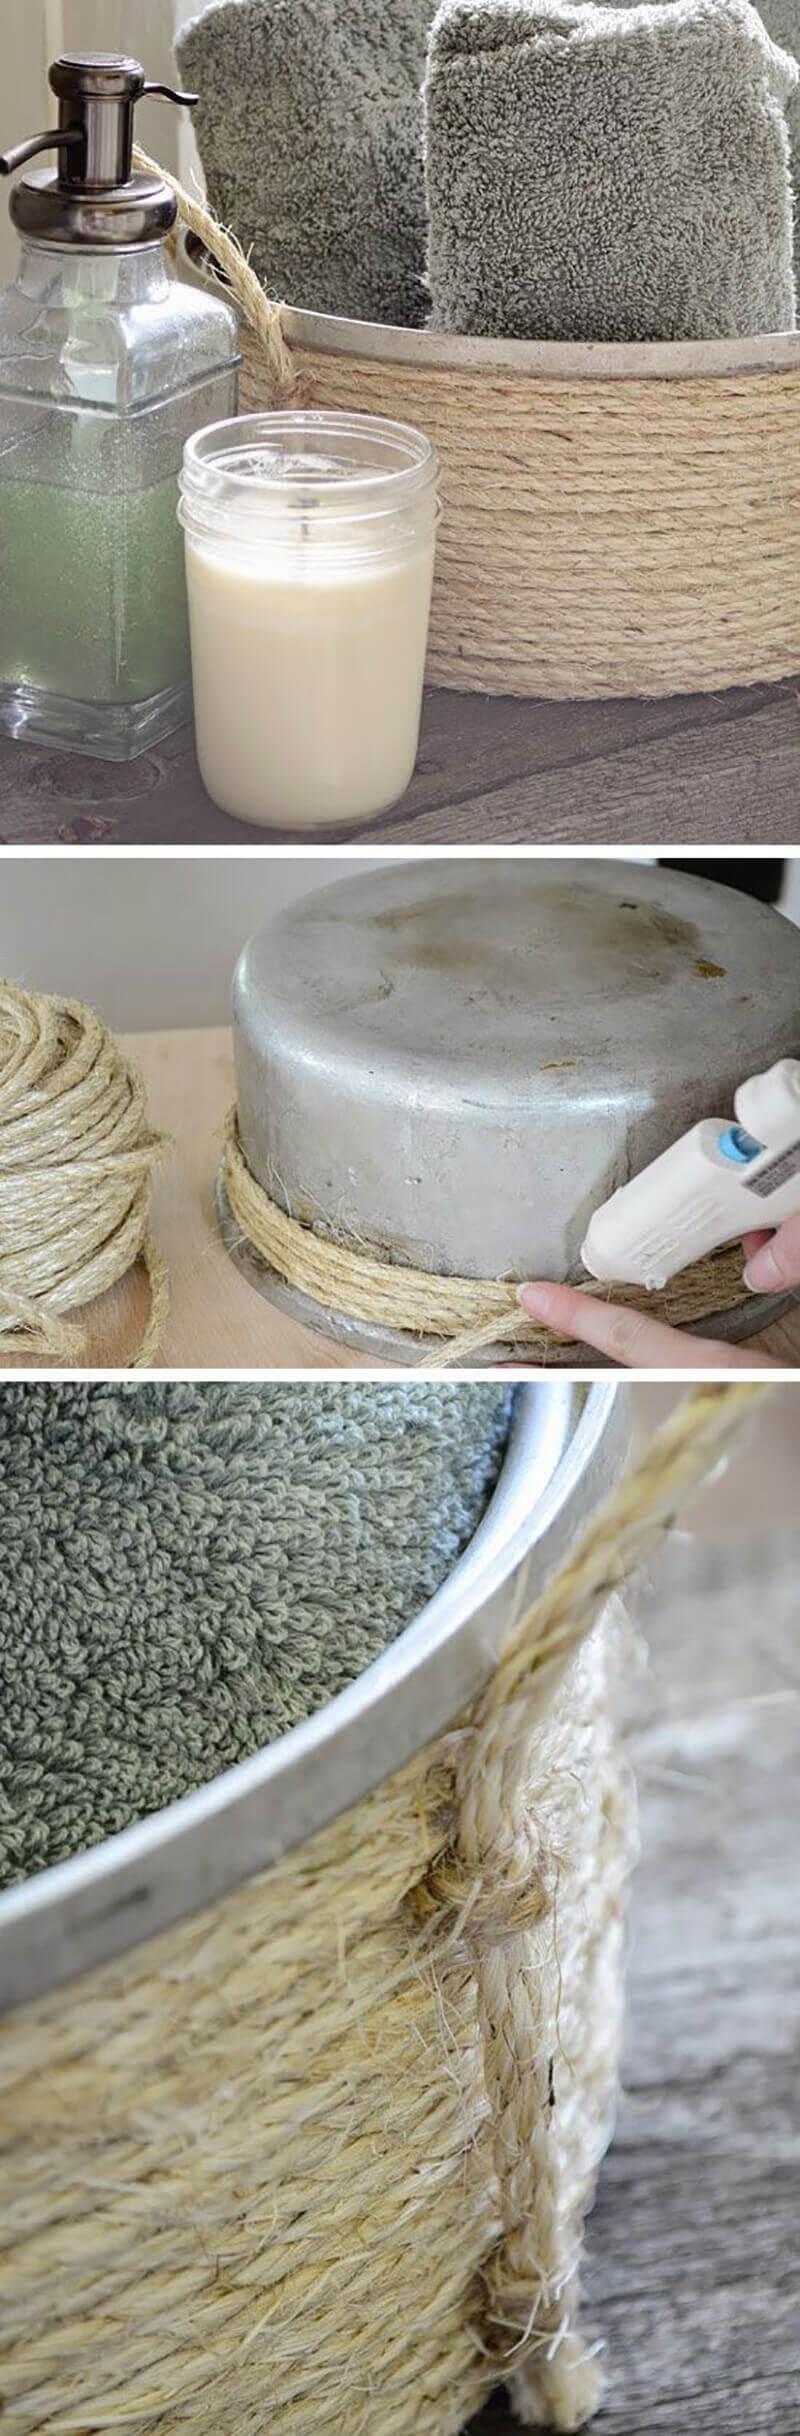 Rustic DIY Sisal Rope Towel Tote